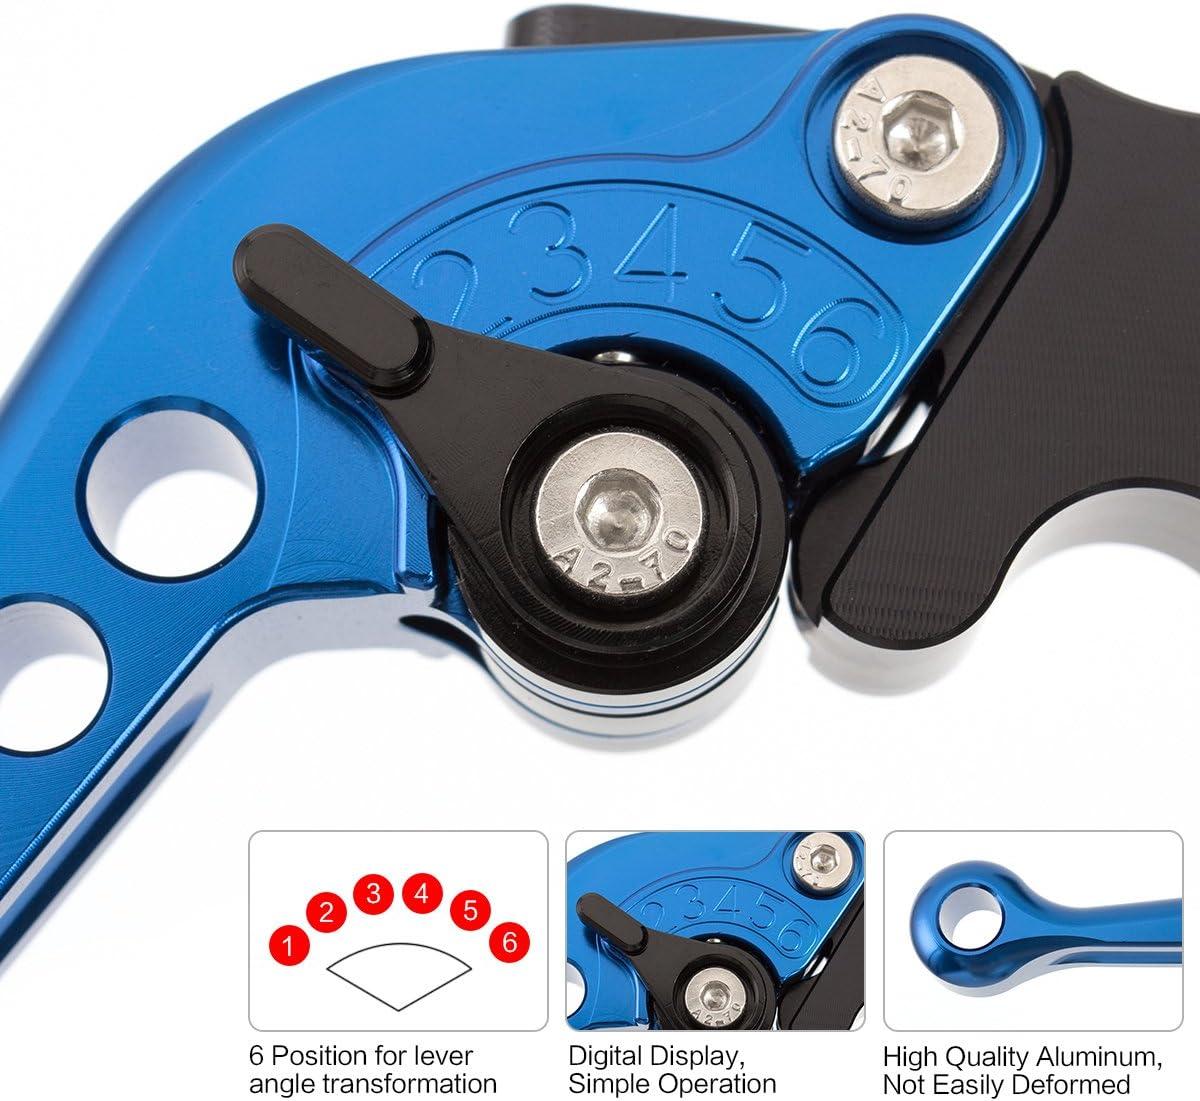 color tree Blue CNC 6 Position Shorty Brake Clutch Lever for SUZUKI SV650//S 1999 2000 2001 2002 2003 2004 2005 2006 2007 2008 2009 2010